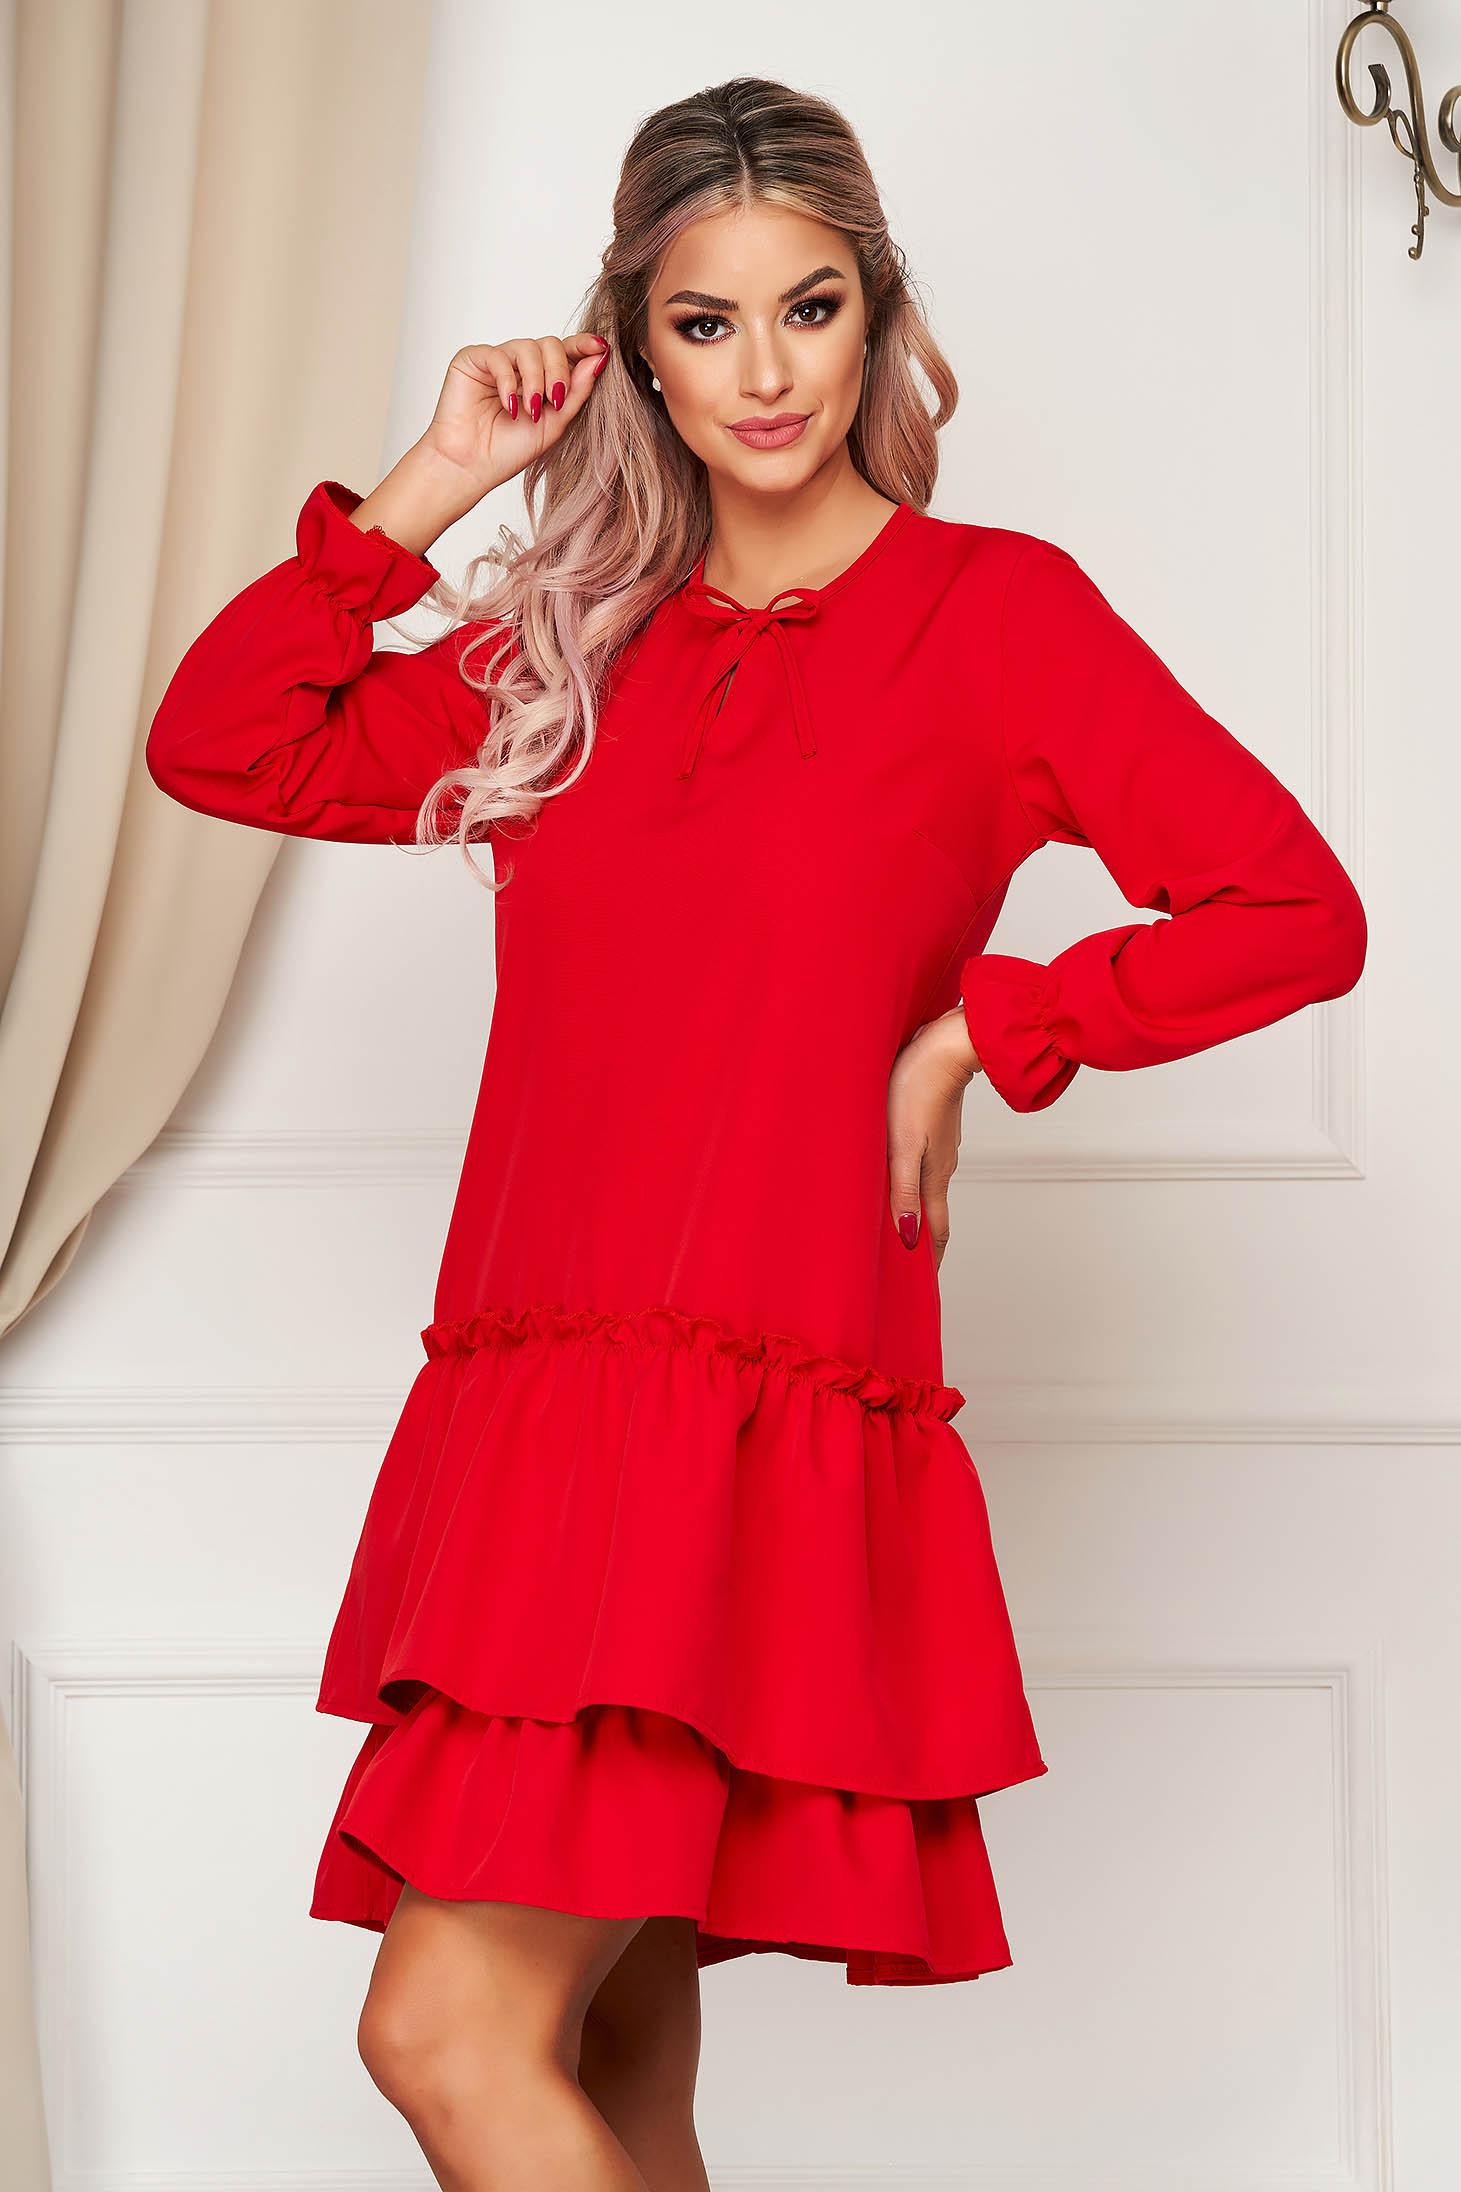 Rochie StarShinerS rosie de zi cu croi larg din material usor elastic cu volanase la baza rochiei